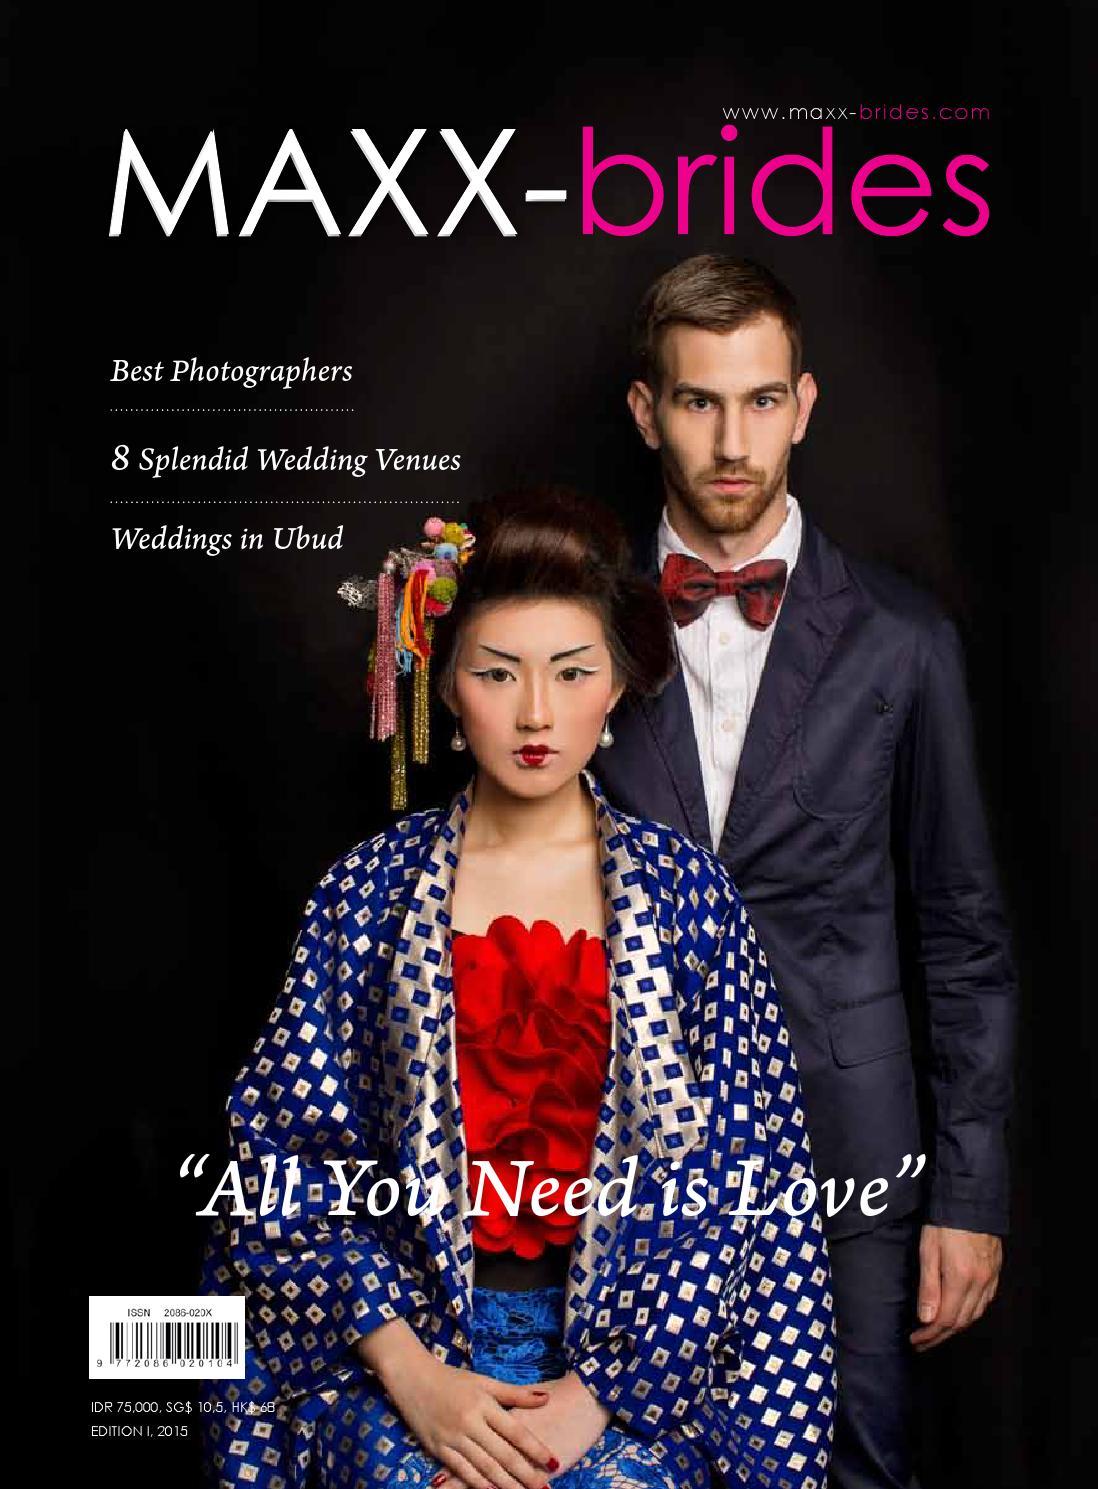 Maxx Brides Edition 1 2015 By Maximillian Publishing Issuu Andrew Smith Blue Floral Shirt Biru M